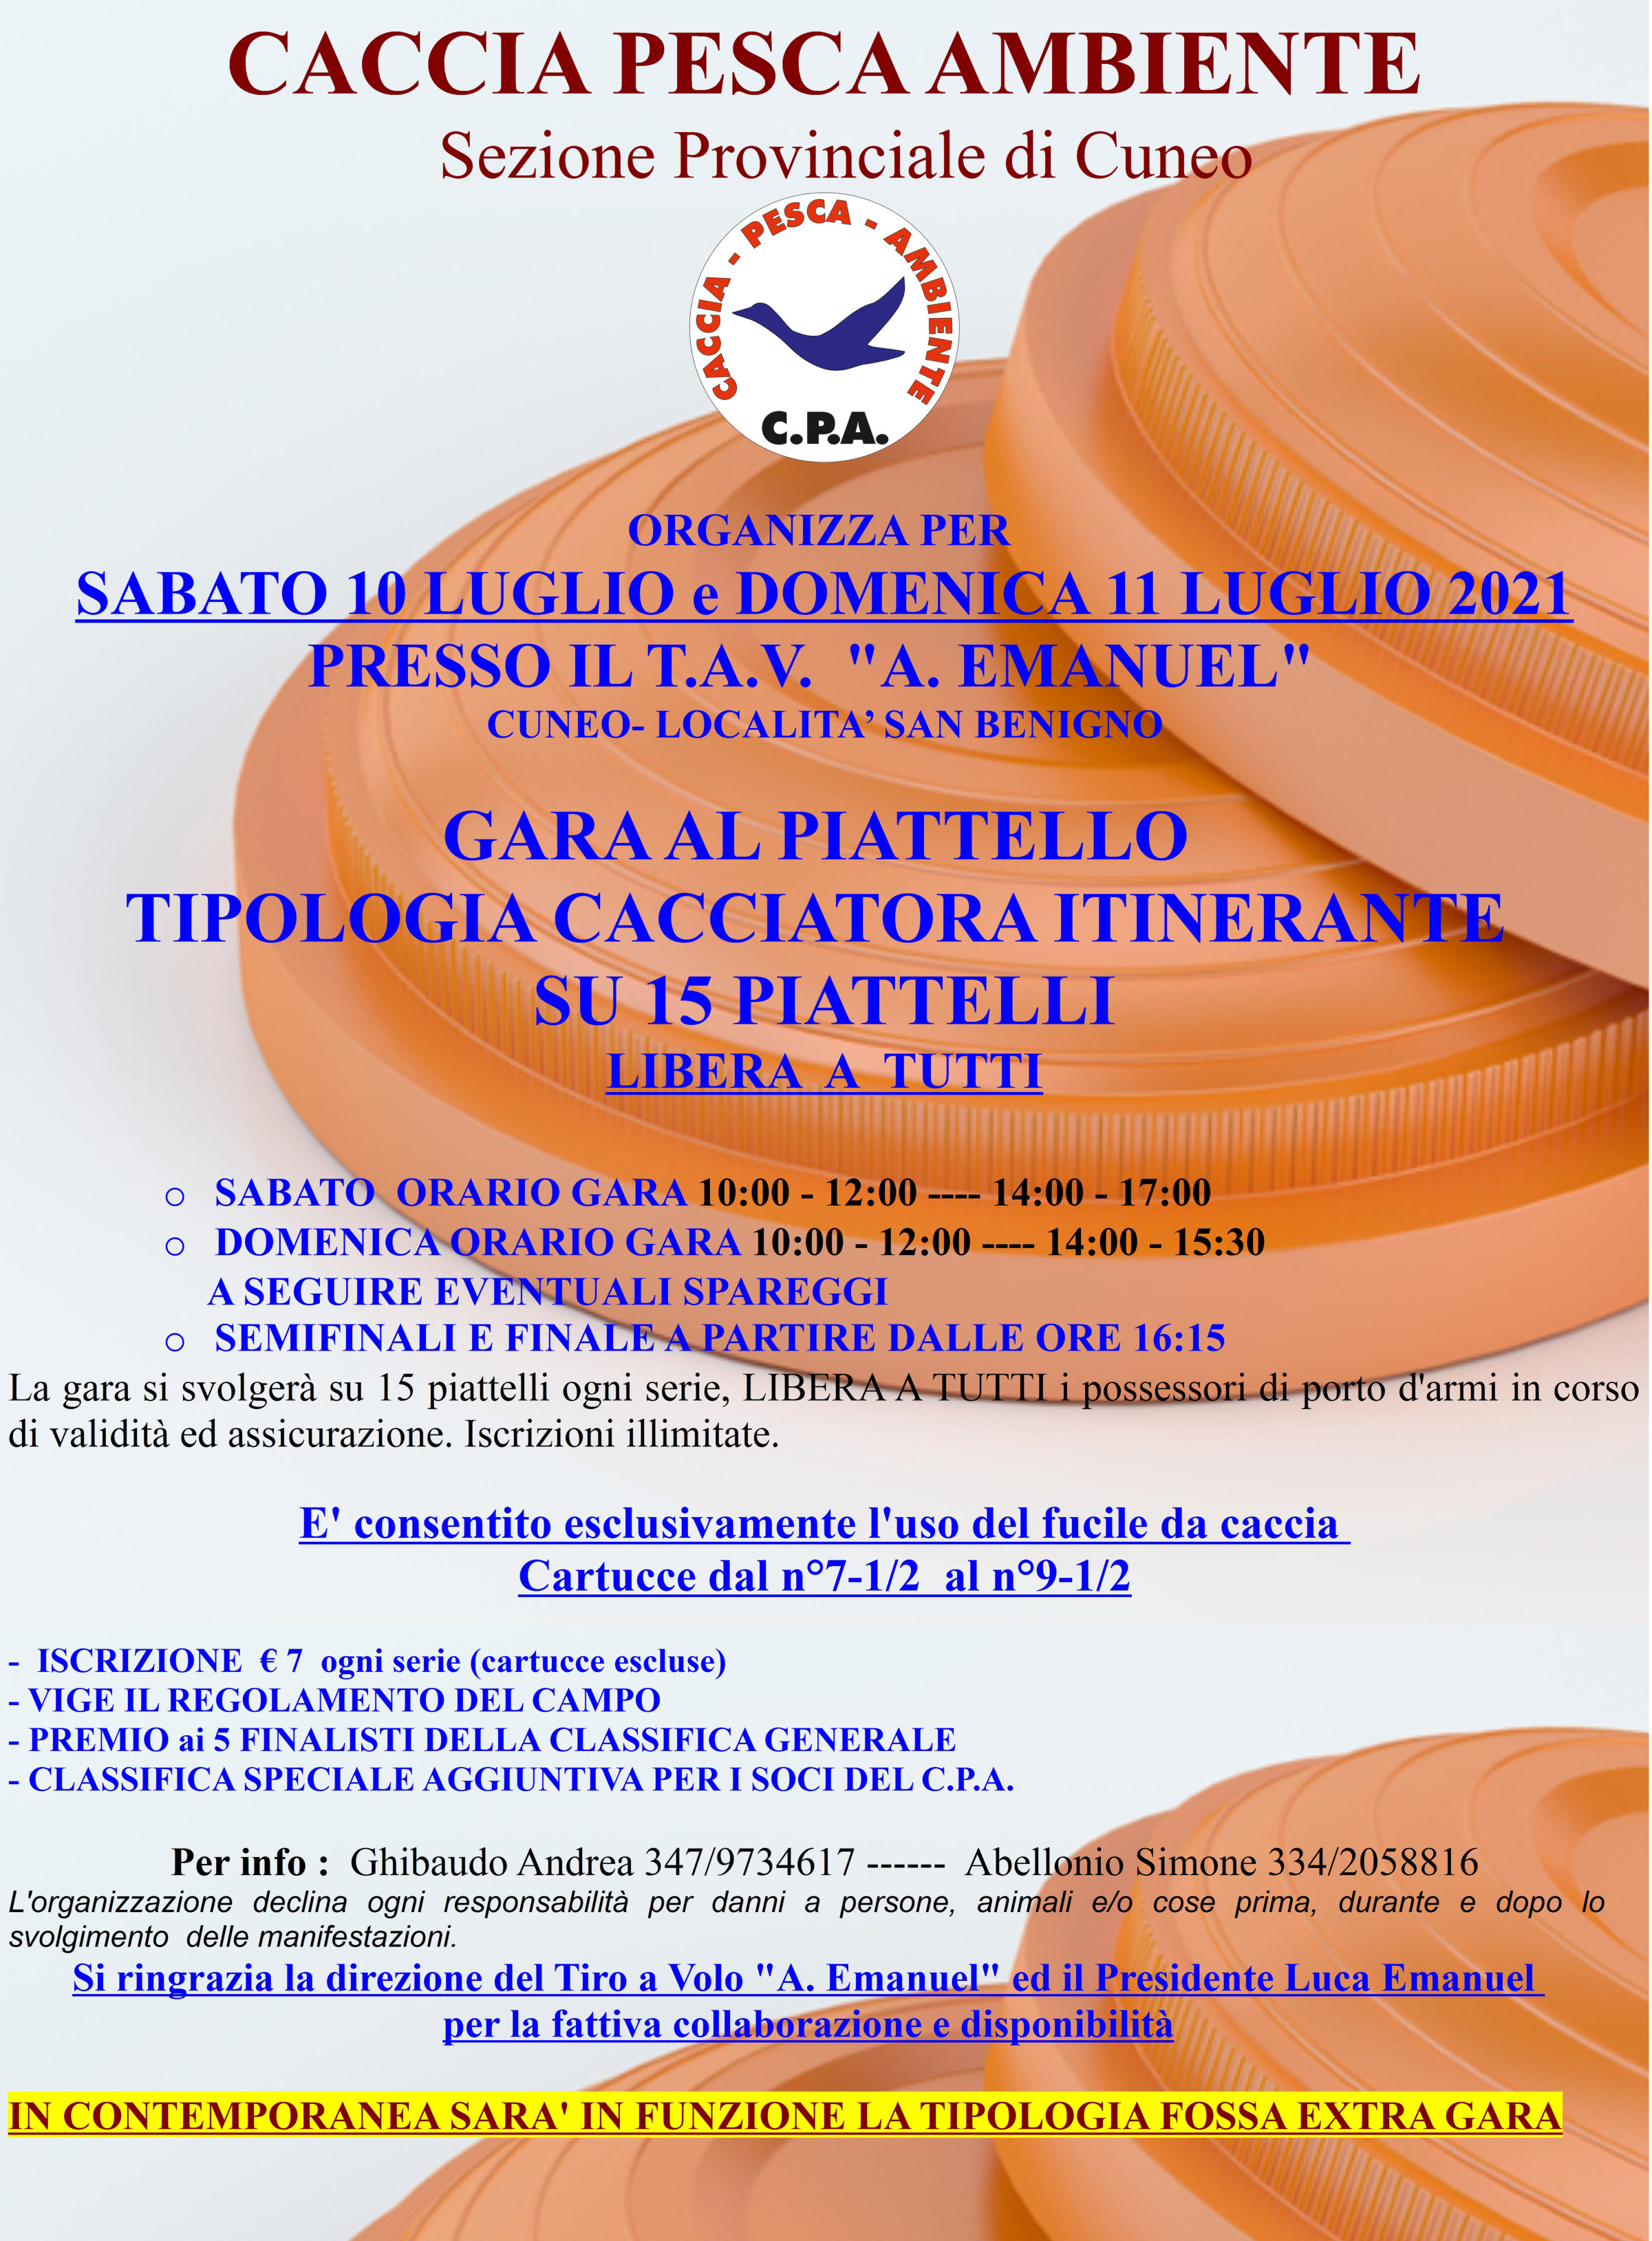 "GARA AL PIATTELLO – 10/11 LUGLIO 2021 – TAV ""A. EMANUEL"" LOC. S. BENIGNO (CUNEO)"